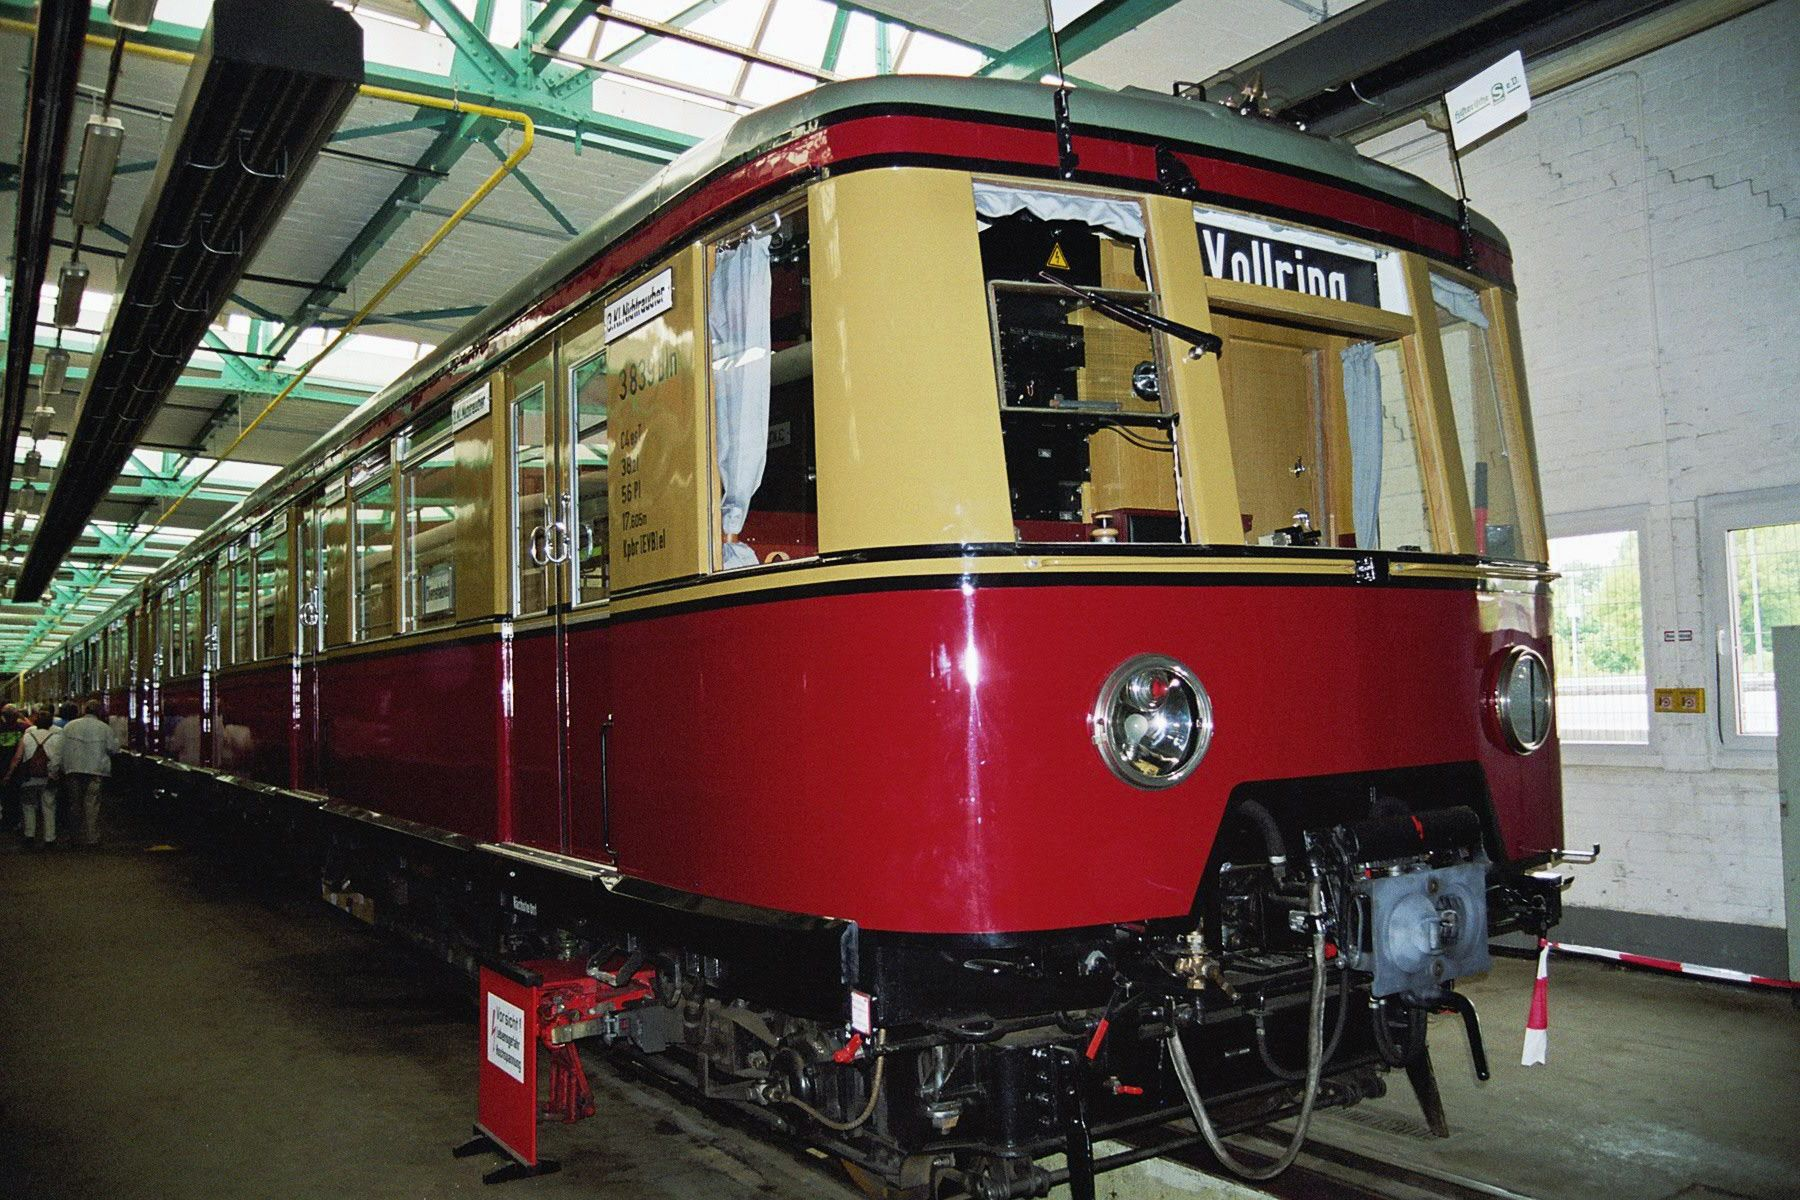 S-Bahn 3839, Bauart 1938/1941, Baureihe 167, Erkner, Mai 2005